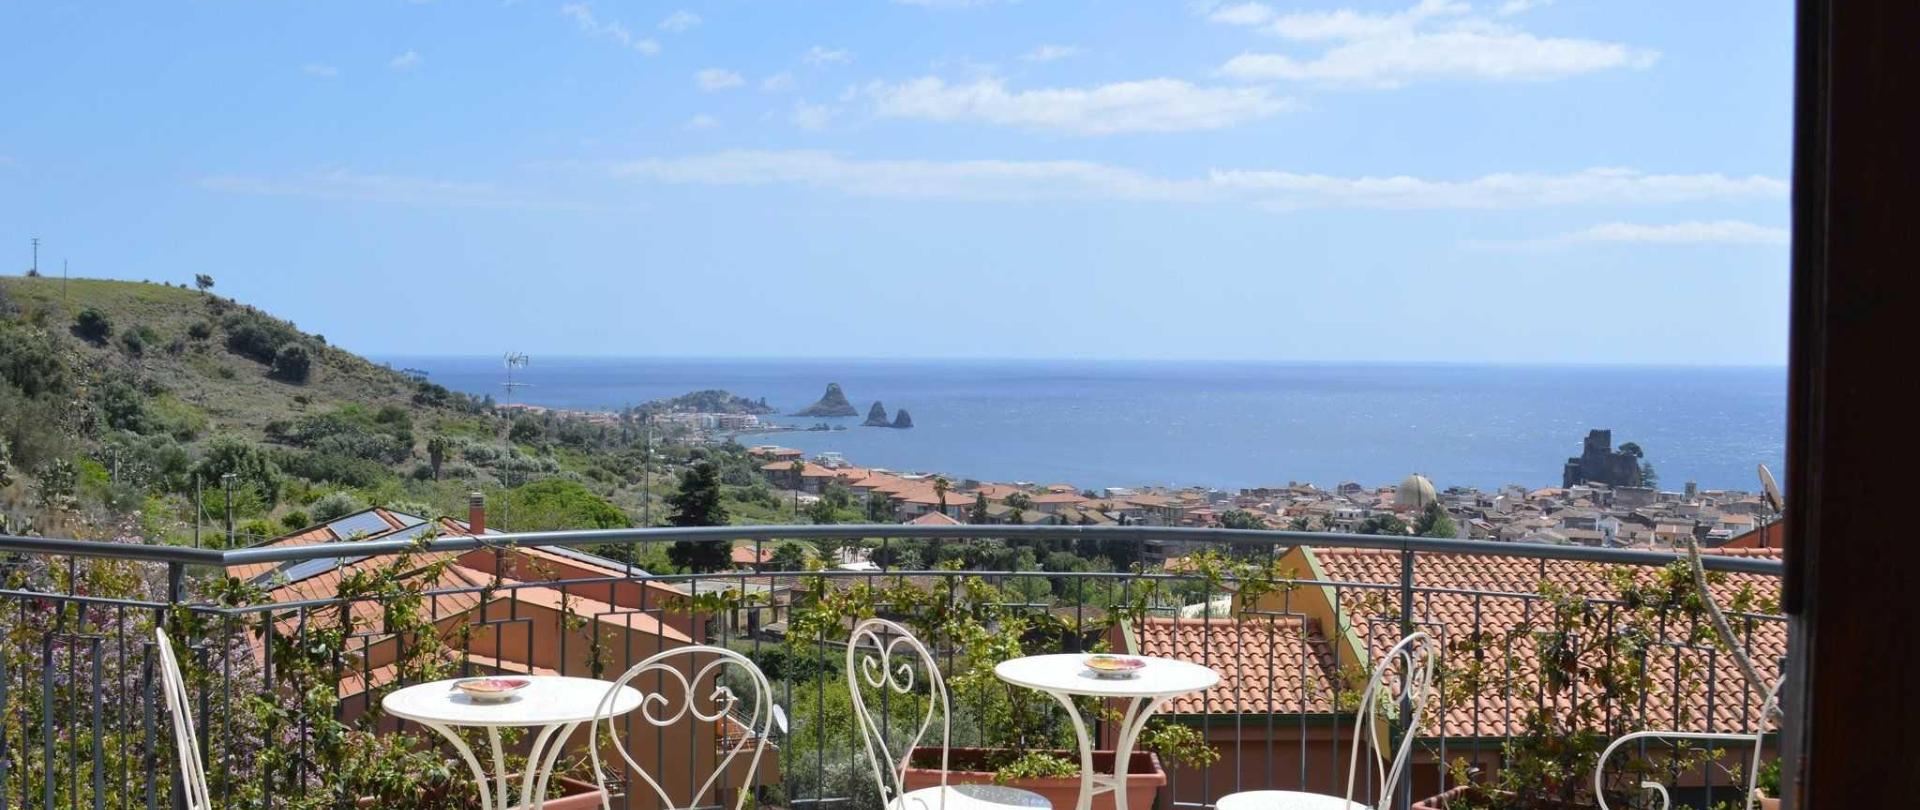 sala-colazione-terrazza-panoramica.jpg